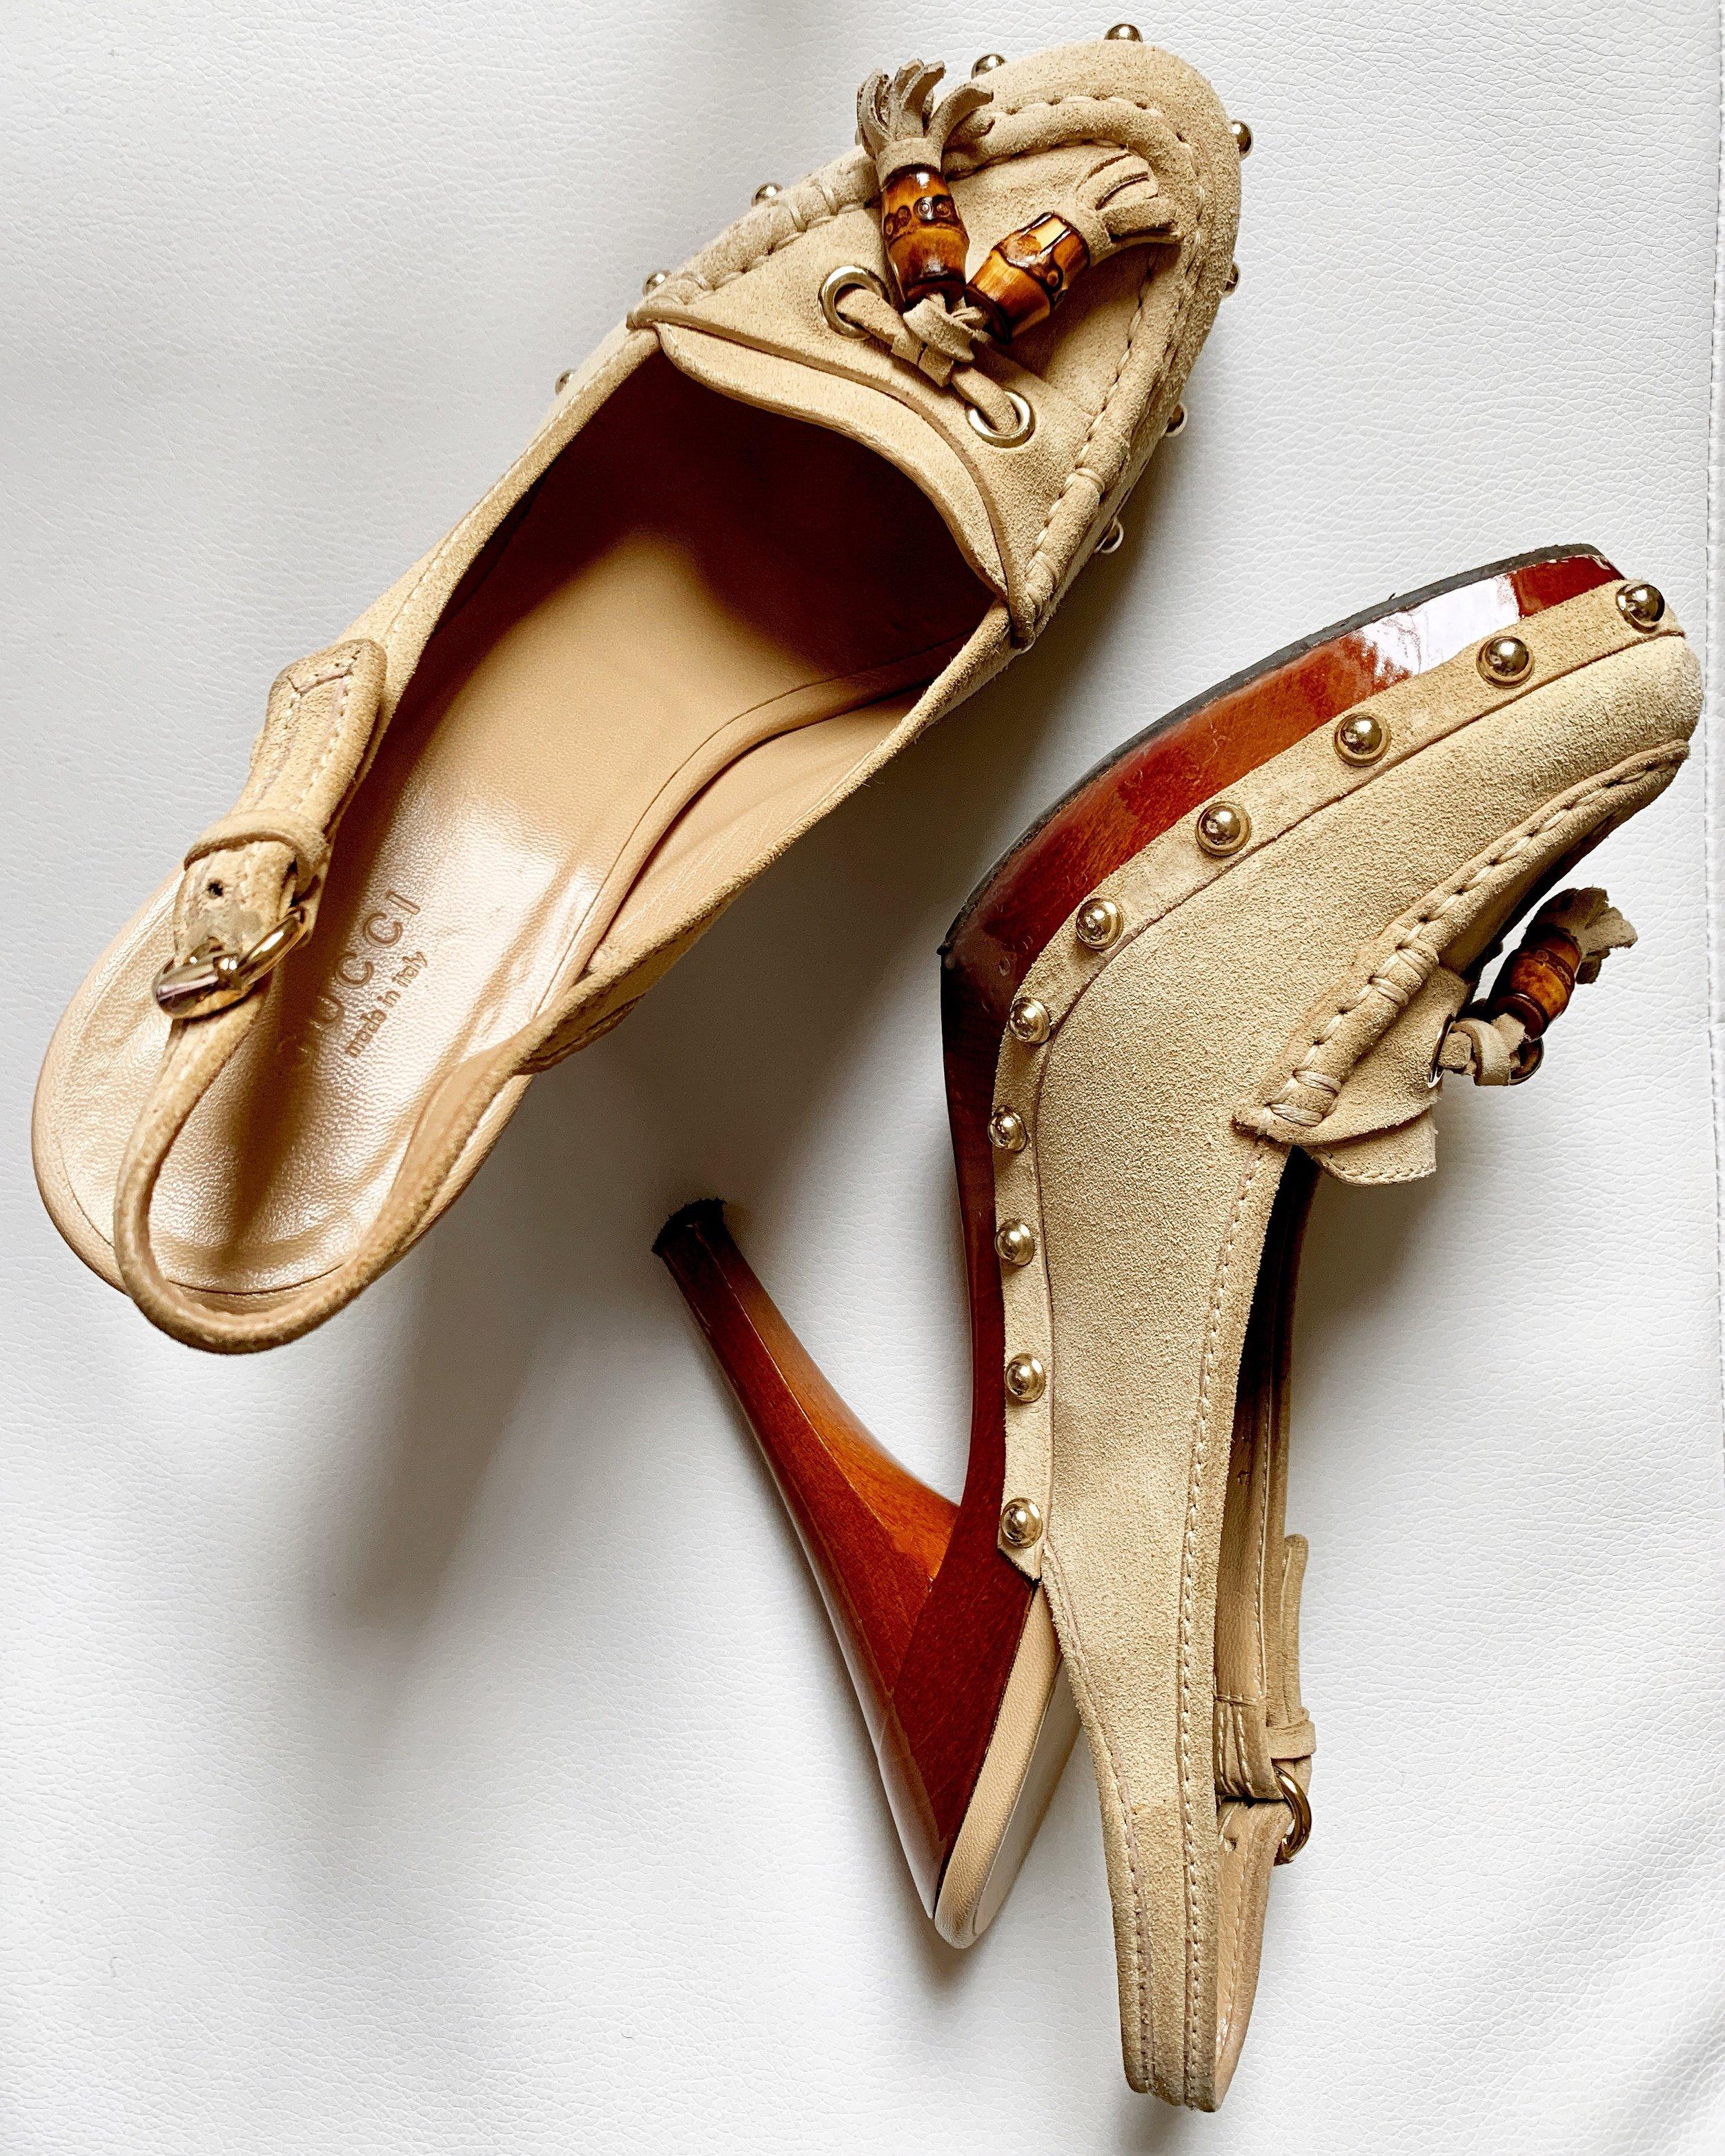 Gucci Shoes.JPG